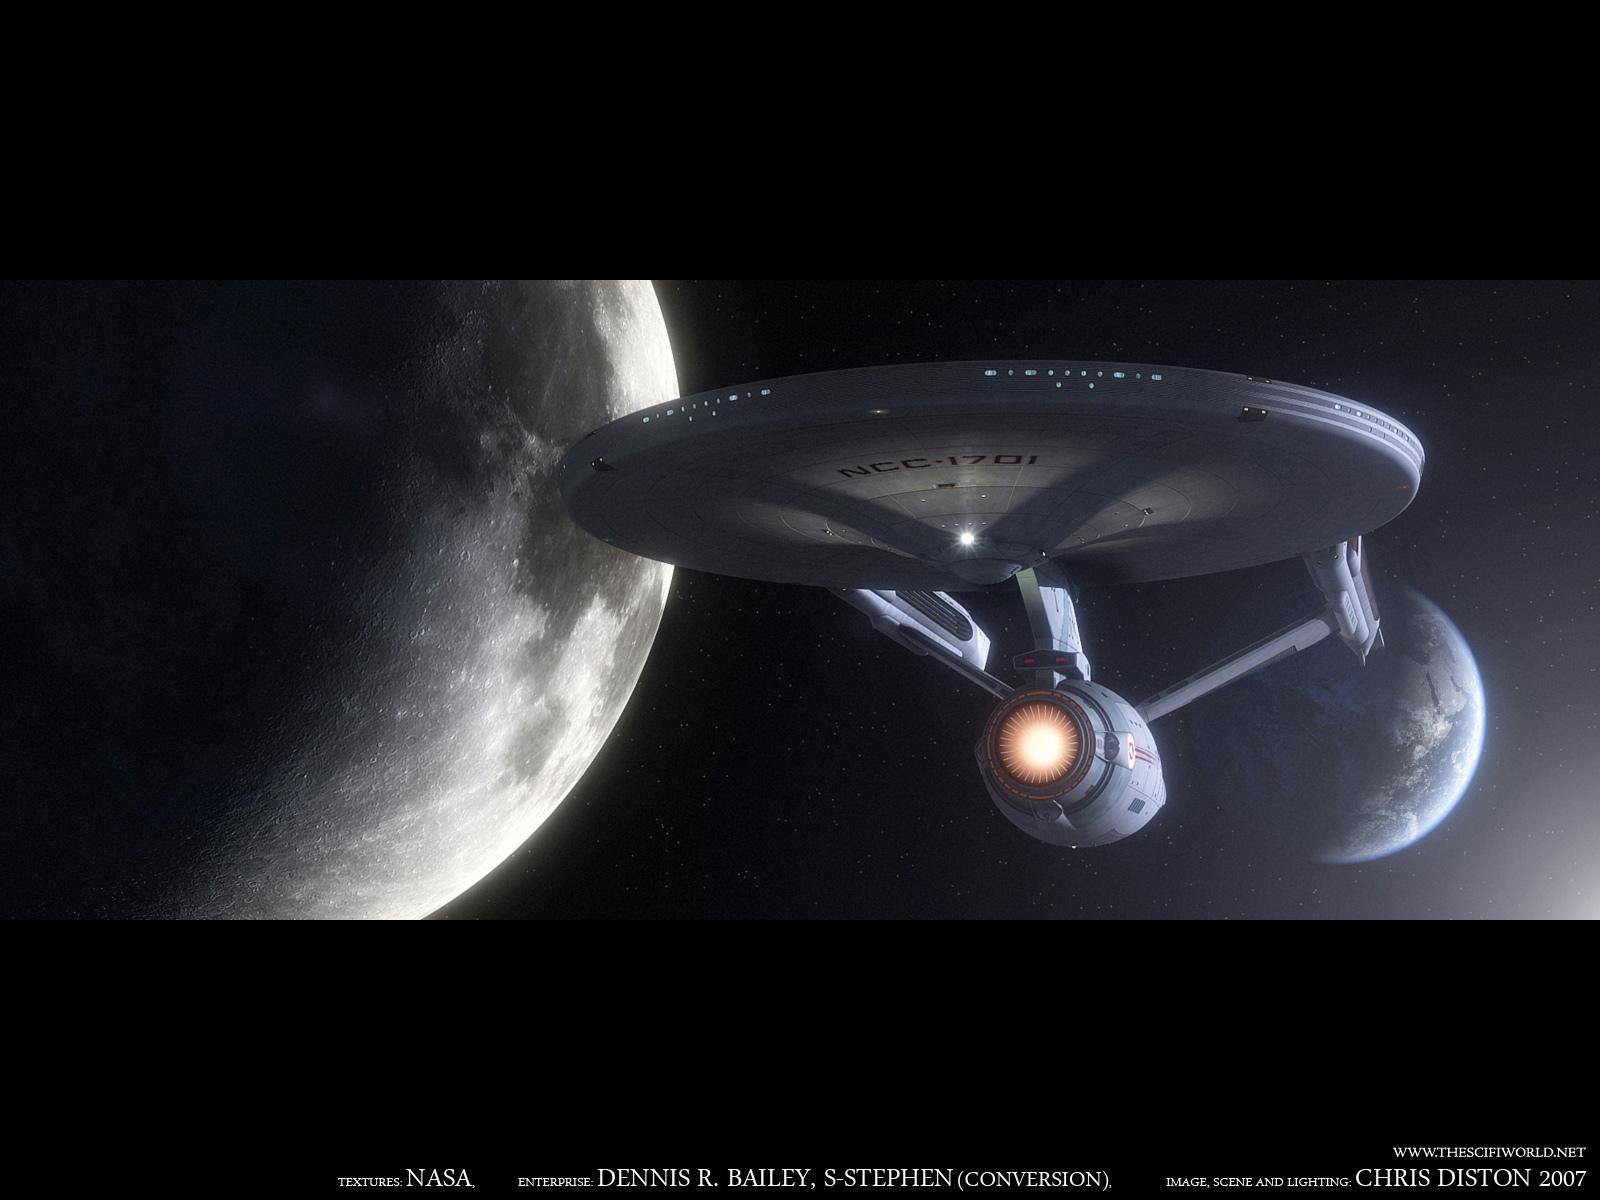 Download Star Trek Original wallpaper Star Trek Starship Enterprise 1600x1200